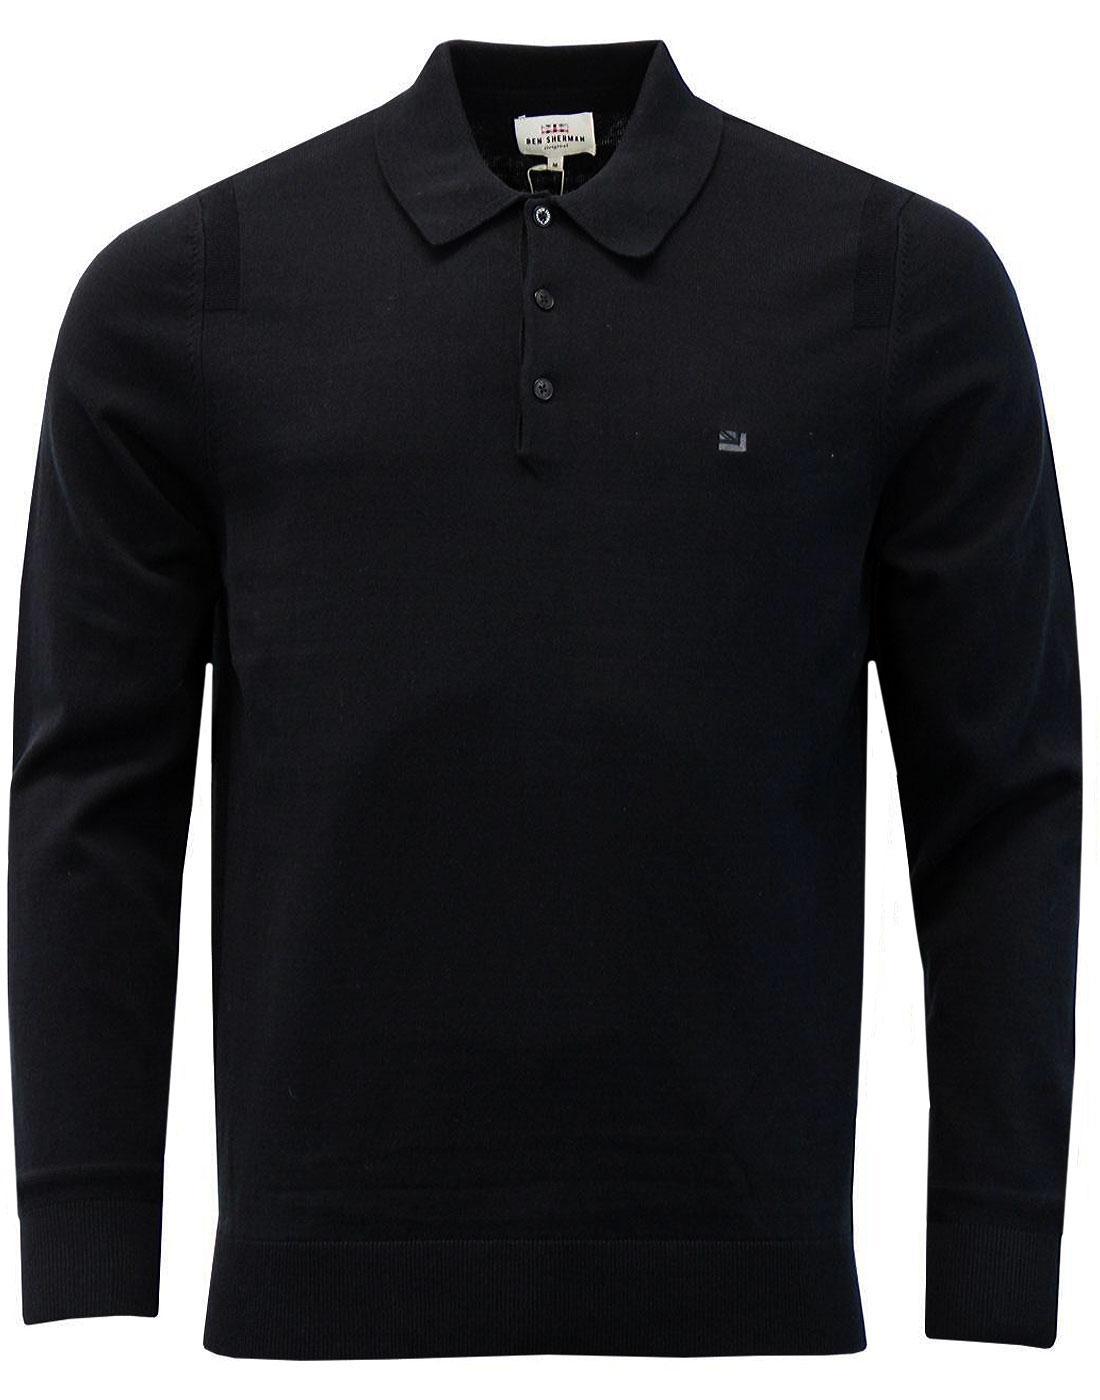 ben sherman men 39 s mod long sleeve knitted polo shirt in black. Black Bedroom Furniture Sets. Home Design Ideas